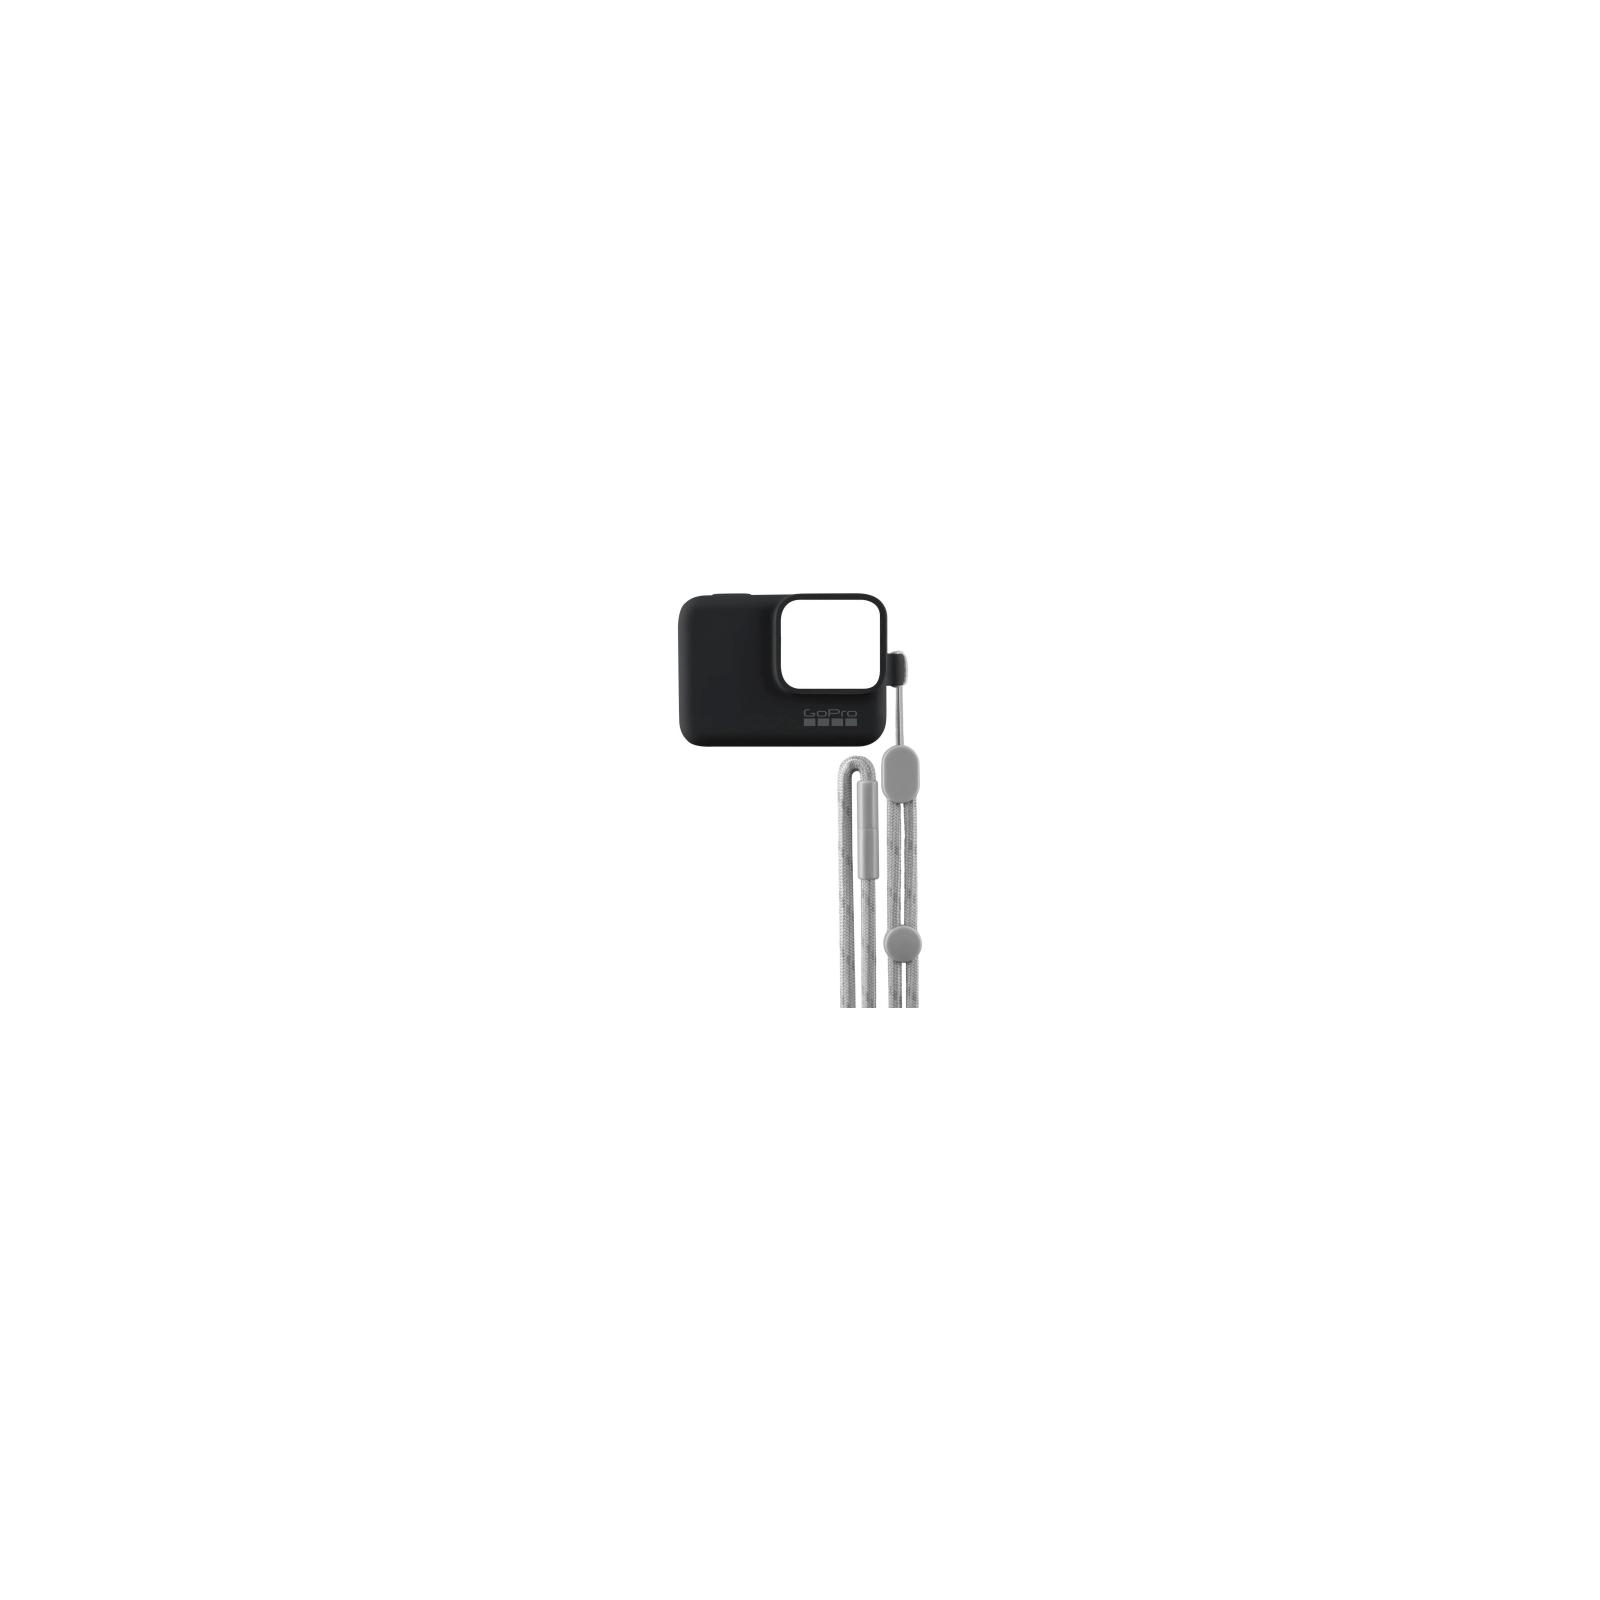 Аксессуар к экшн-камерам GoPro Sleeve & Lanyard (Black) (ACSST-001) изображение 6